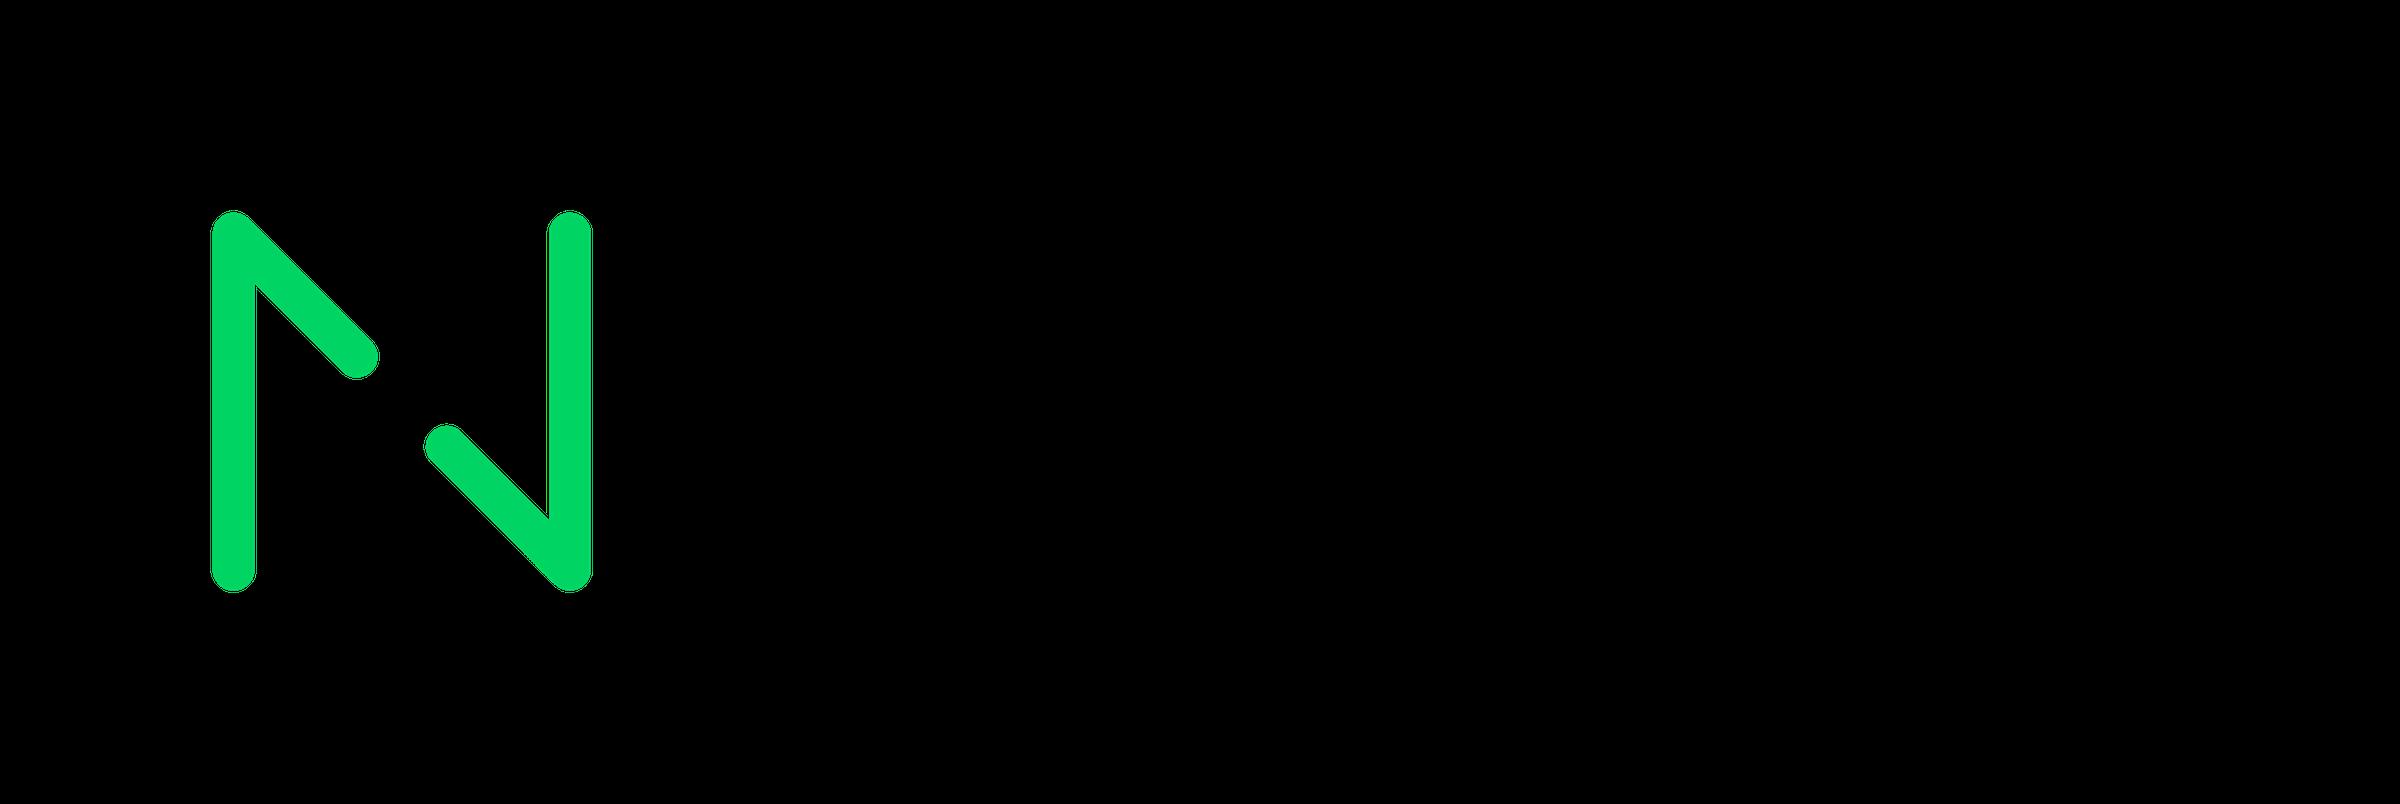 Netguru's logo